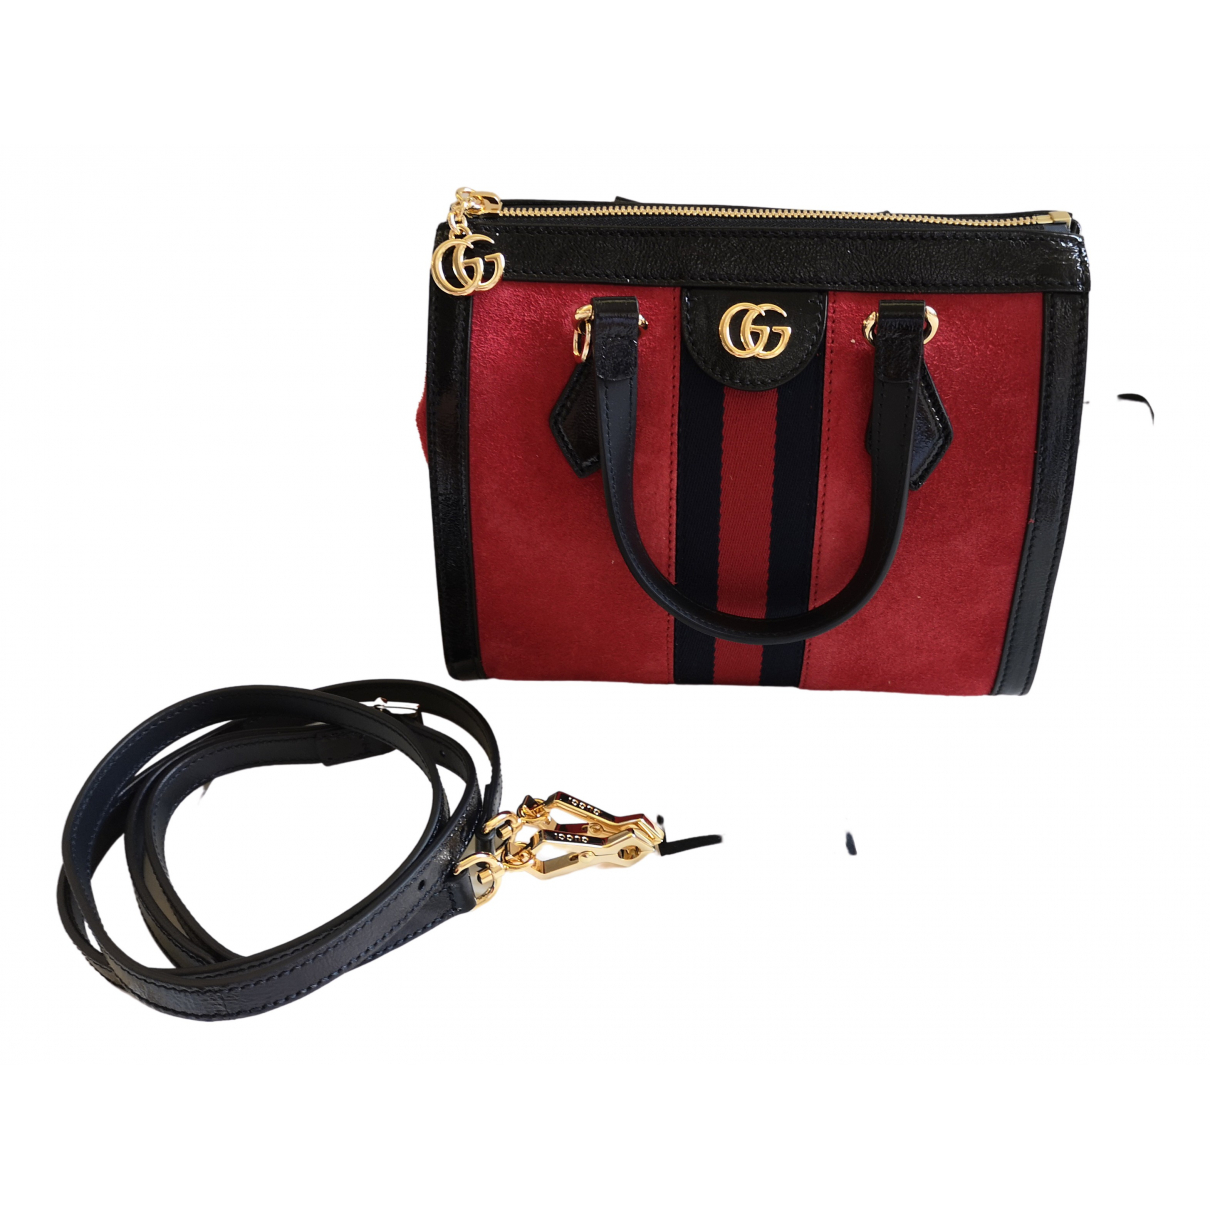 Gucci Ophidia Handtasche in  Rot Veloursleder